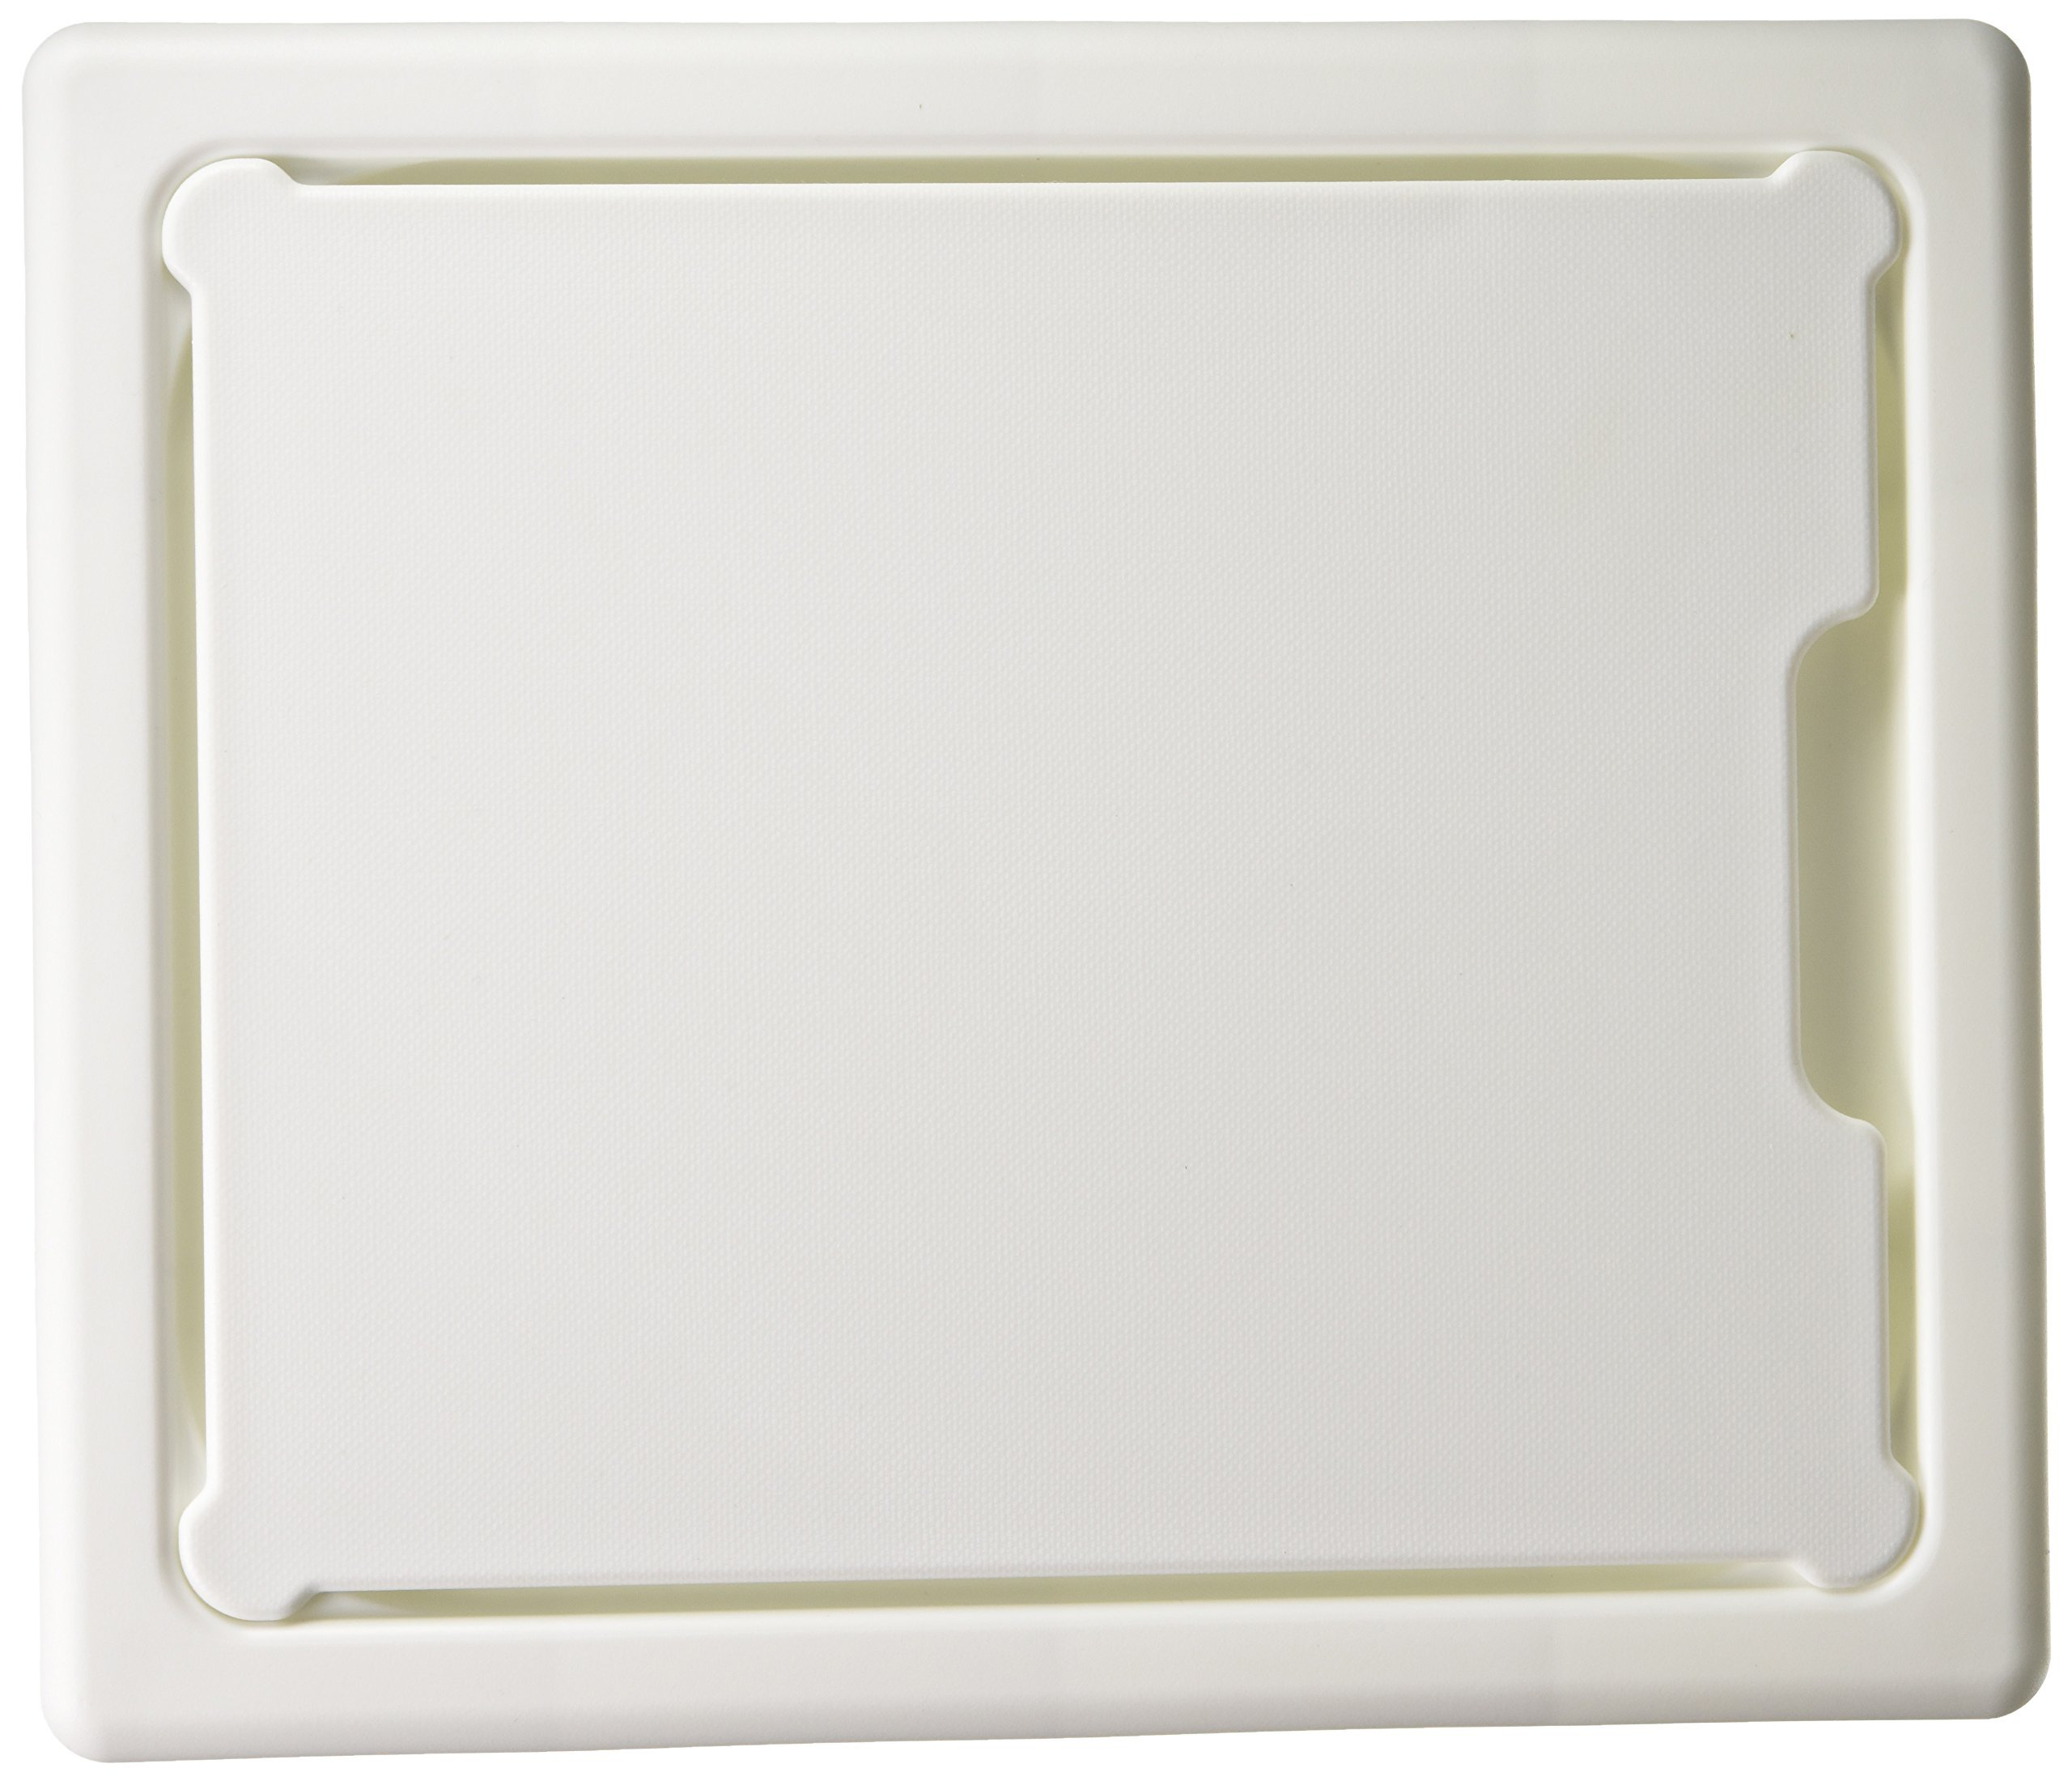 PerfectChop Cutting Board